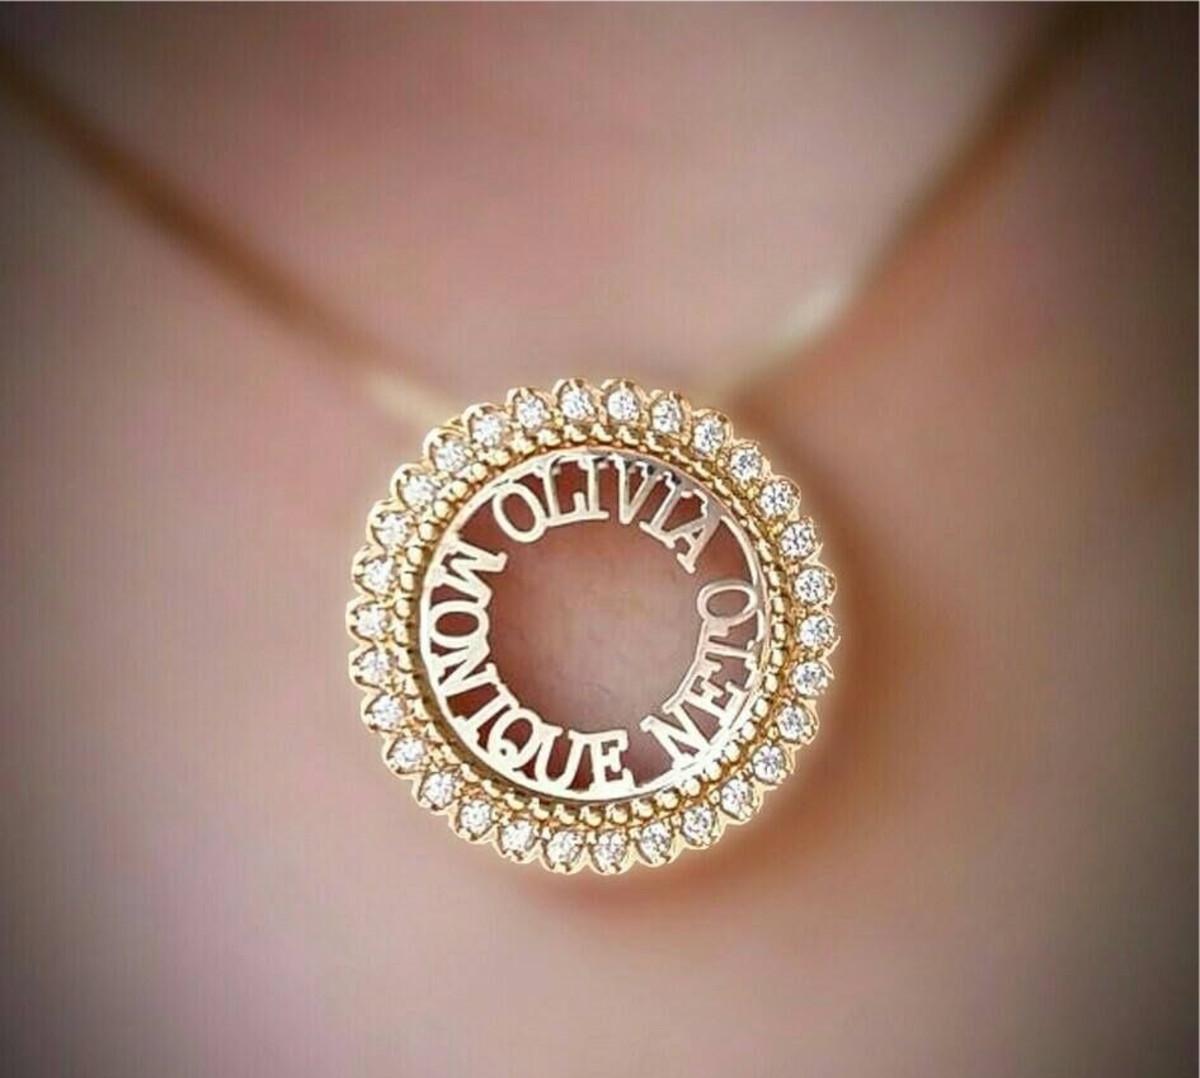 bd52ce552310b Mandala Borda Cravejada Personalizada - Ouro no Elo7